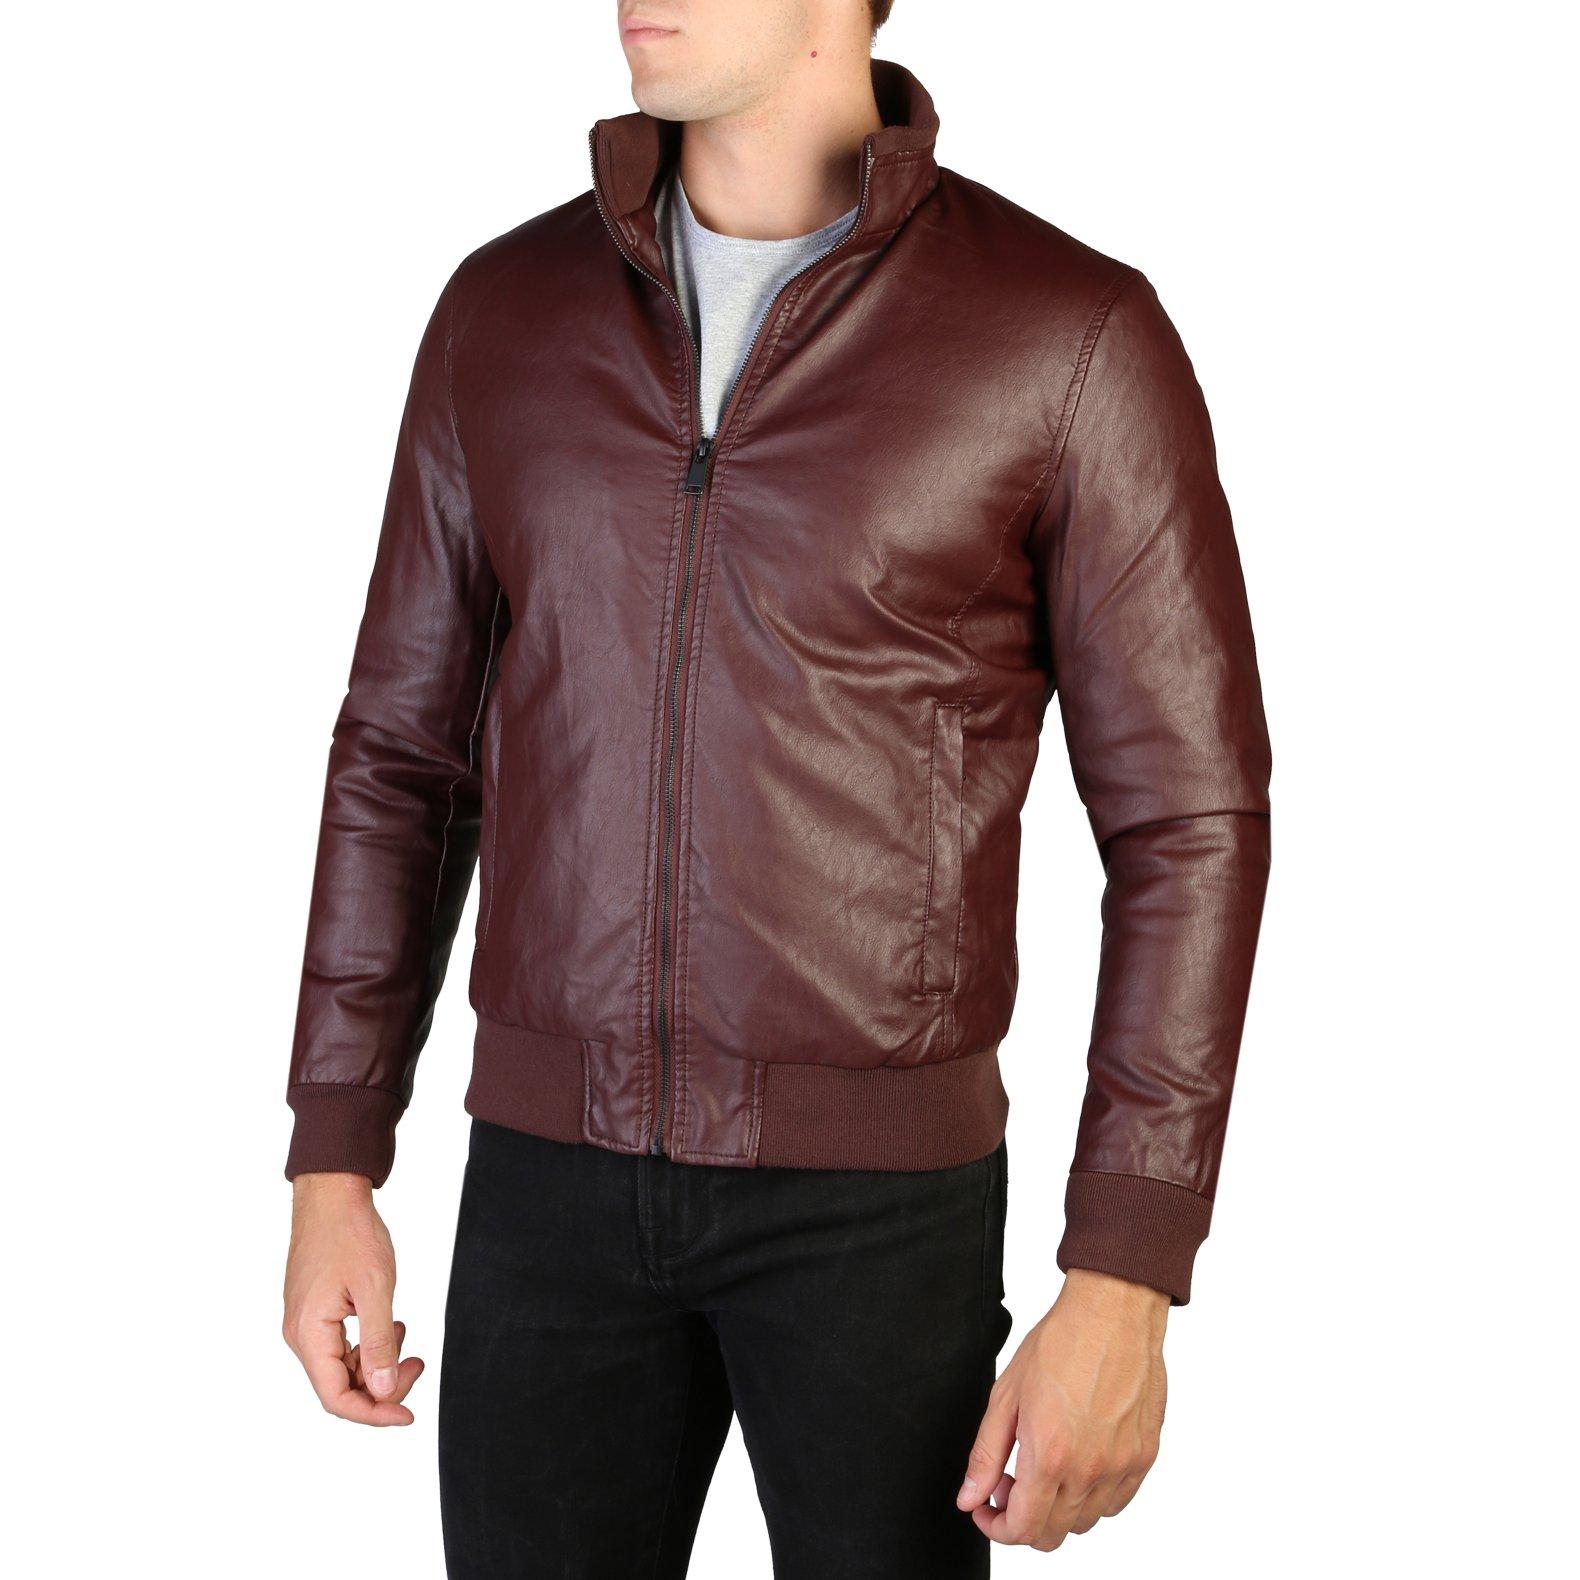 Alessandro Dell'Acqua Men's Jacket Various Colours 348313 - red M